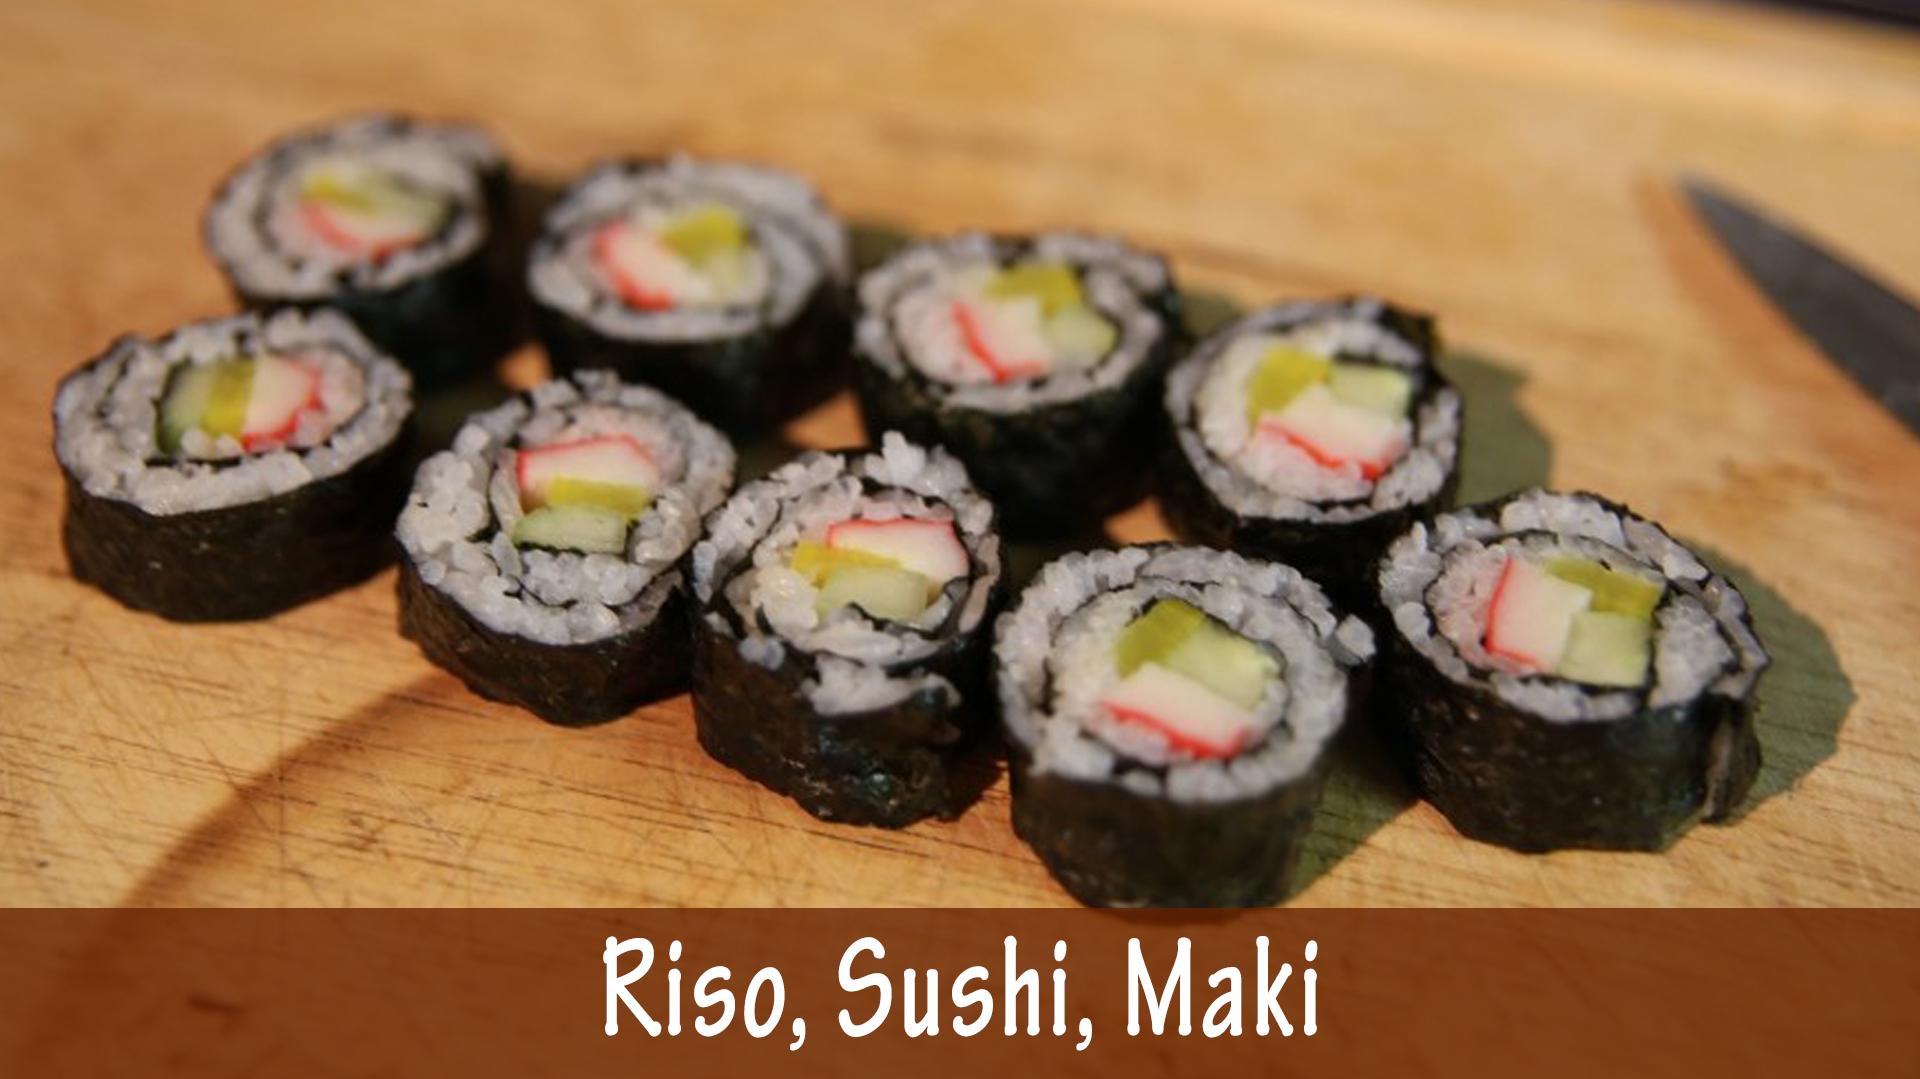 Riso, Sushi, Maki